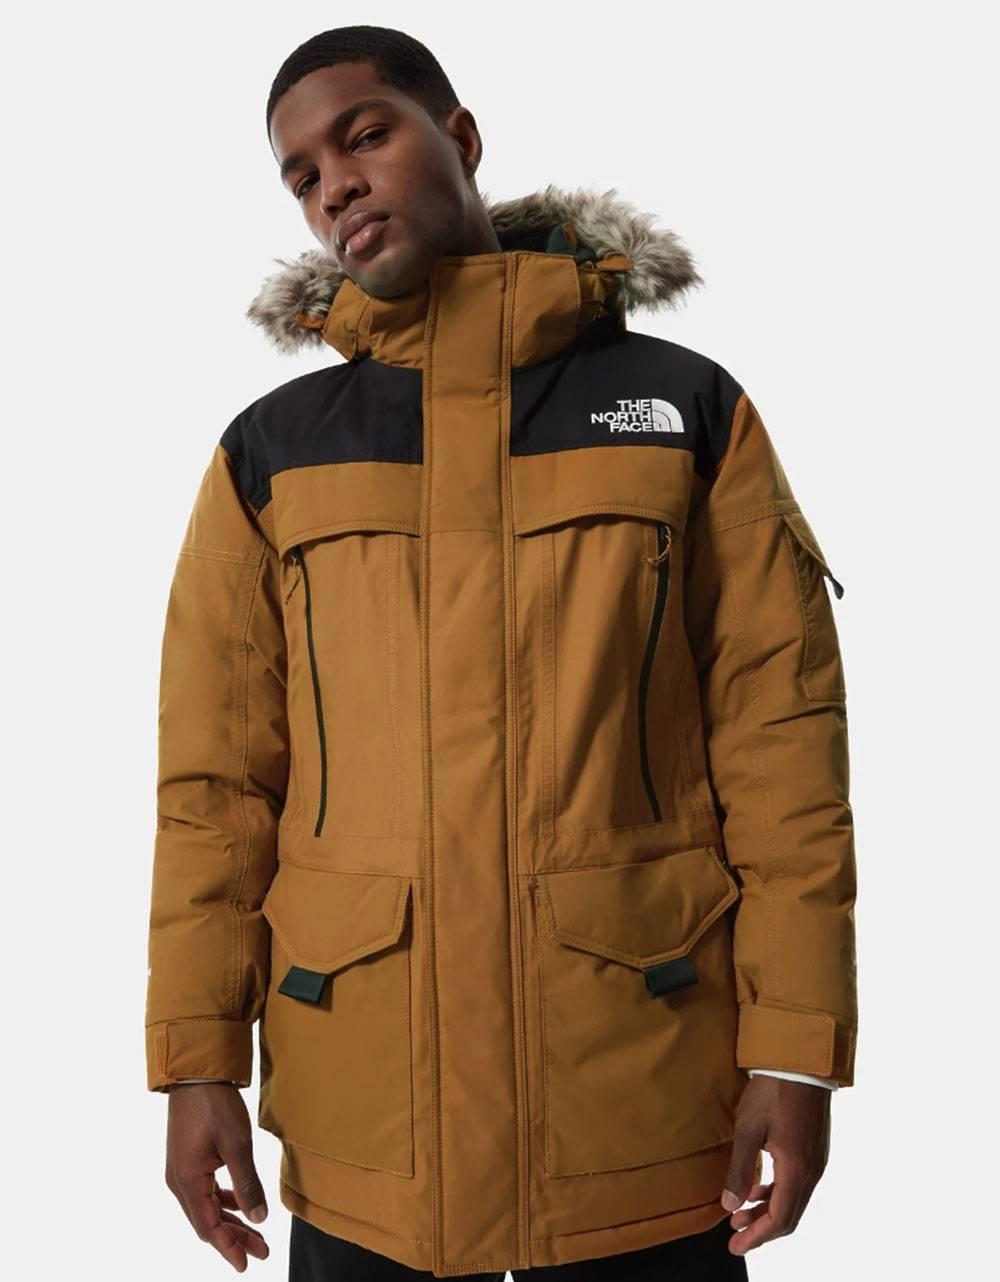 The North Face Mcmurdo 2 parka jacket - timber tan THE NORTH FACE Parka 434,43€